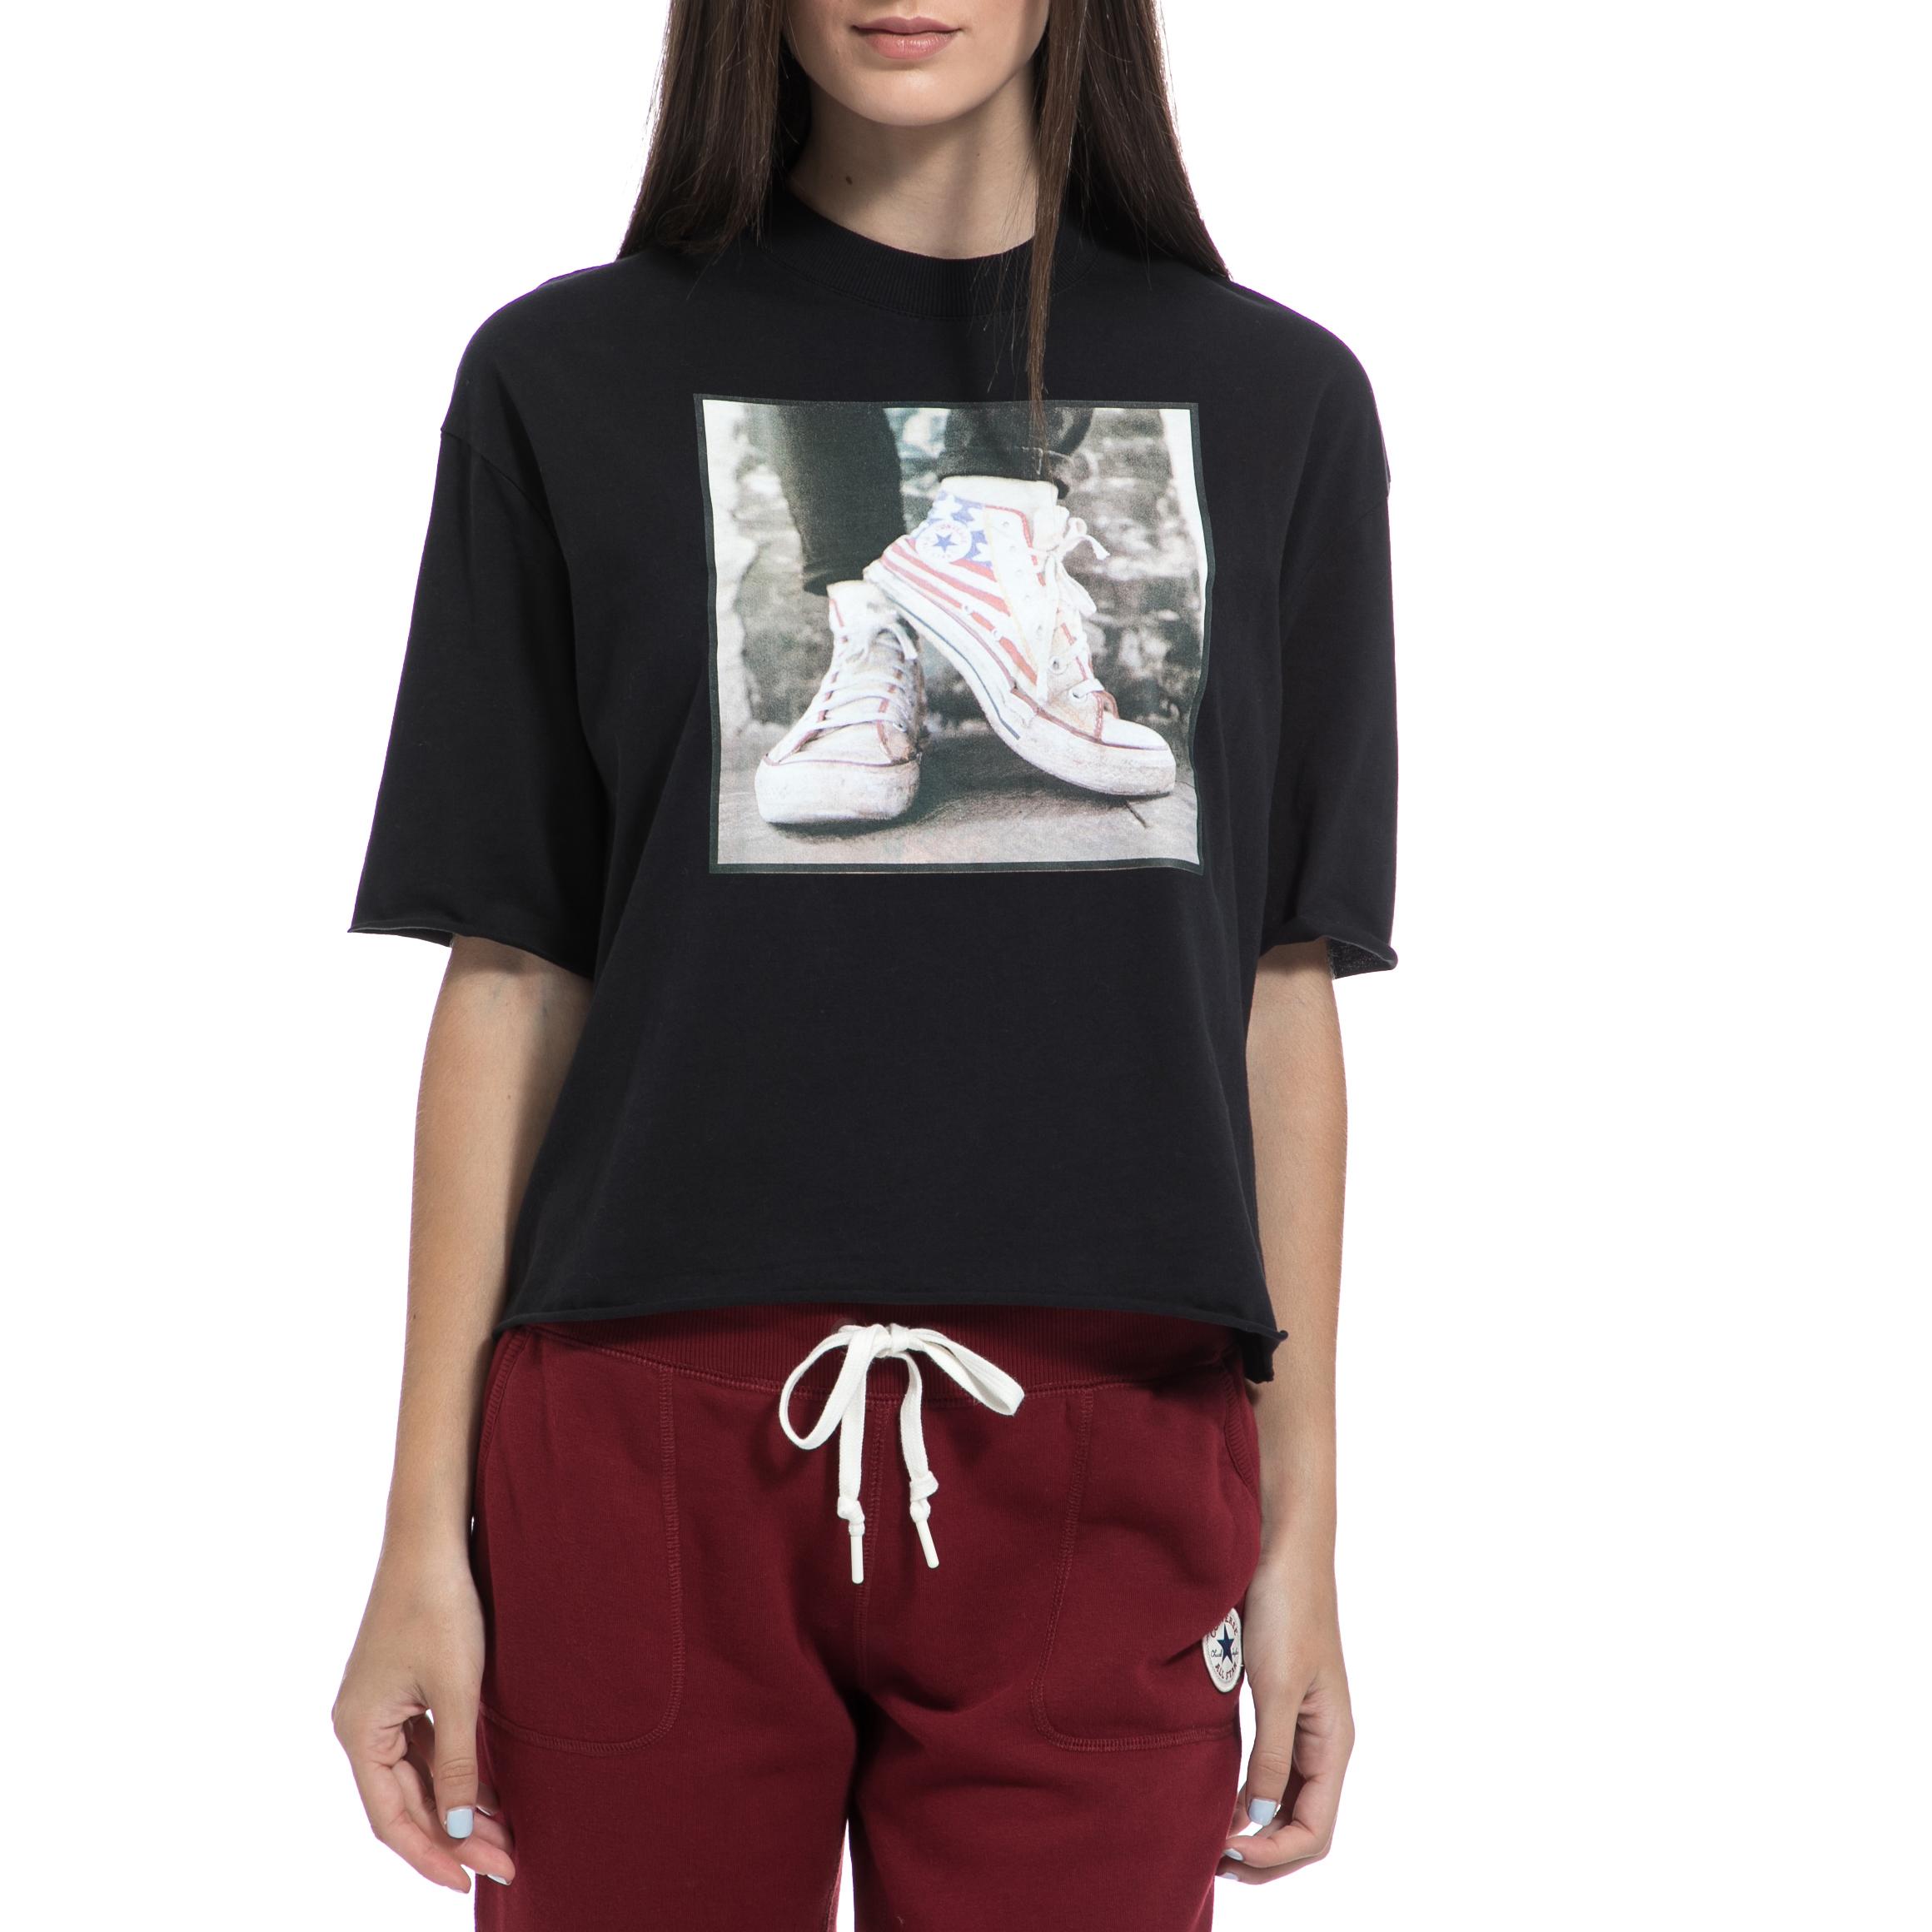 CONVERSE - Γυναικεία μπλούζα CONVERSE μαύρη γυναικεία ρούχα αθλητικά t shirt τοπ